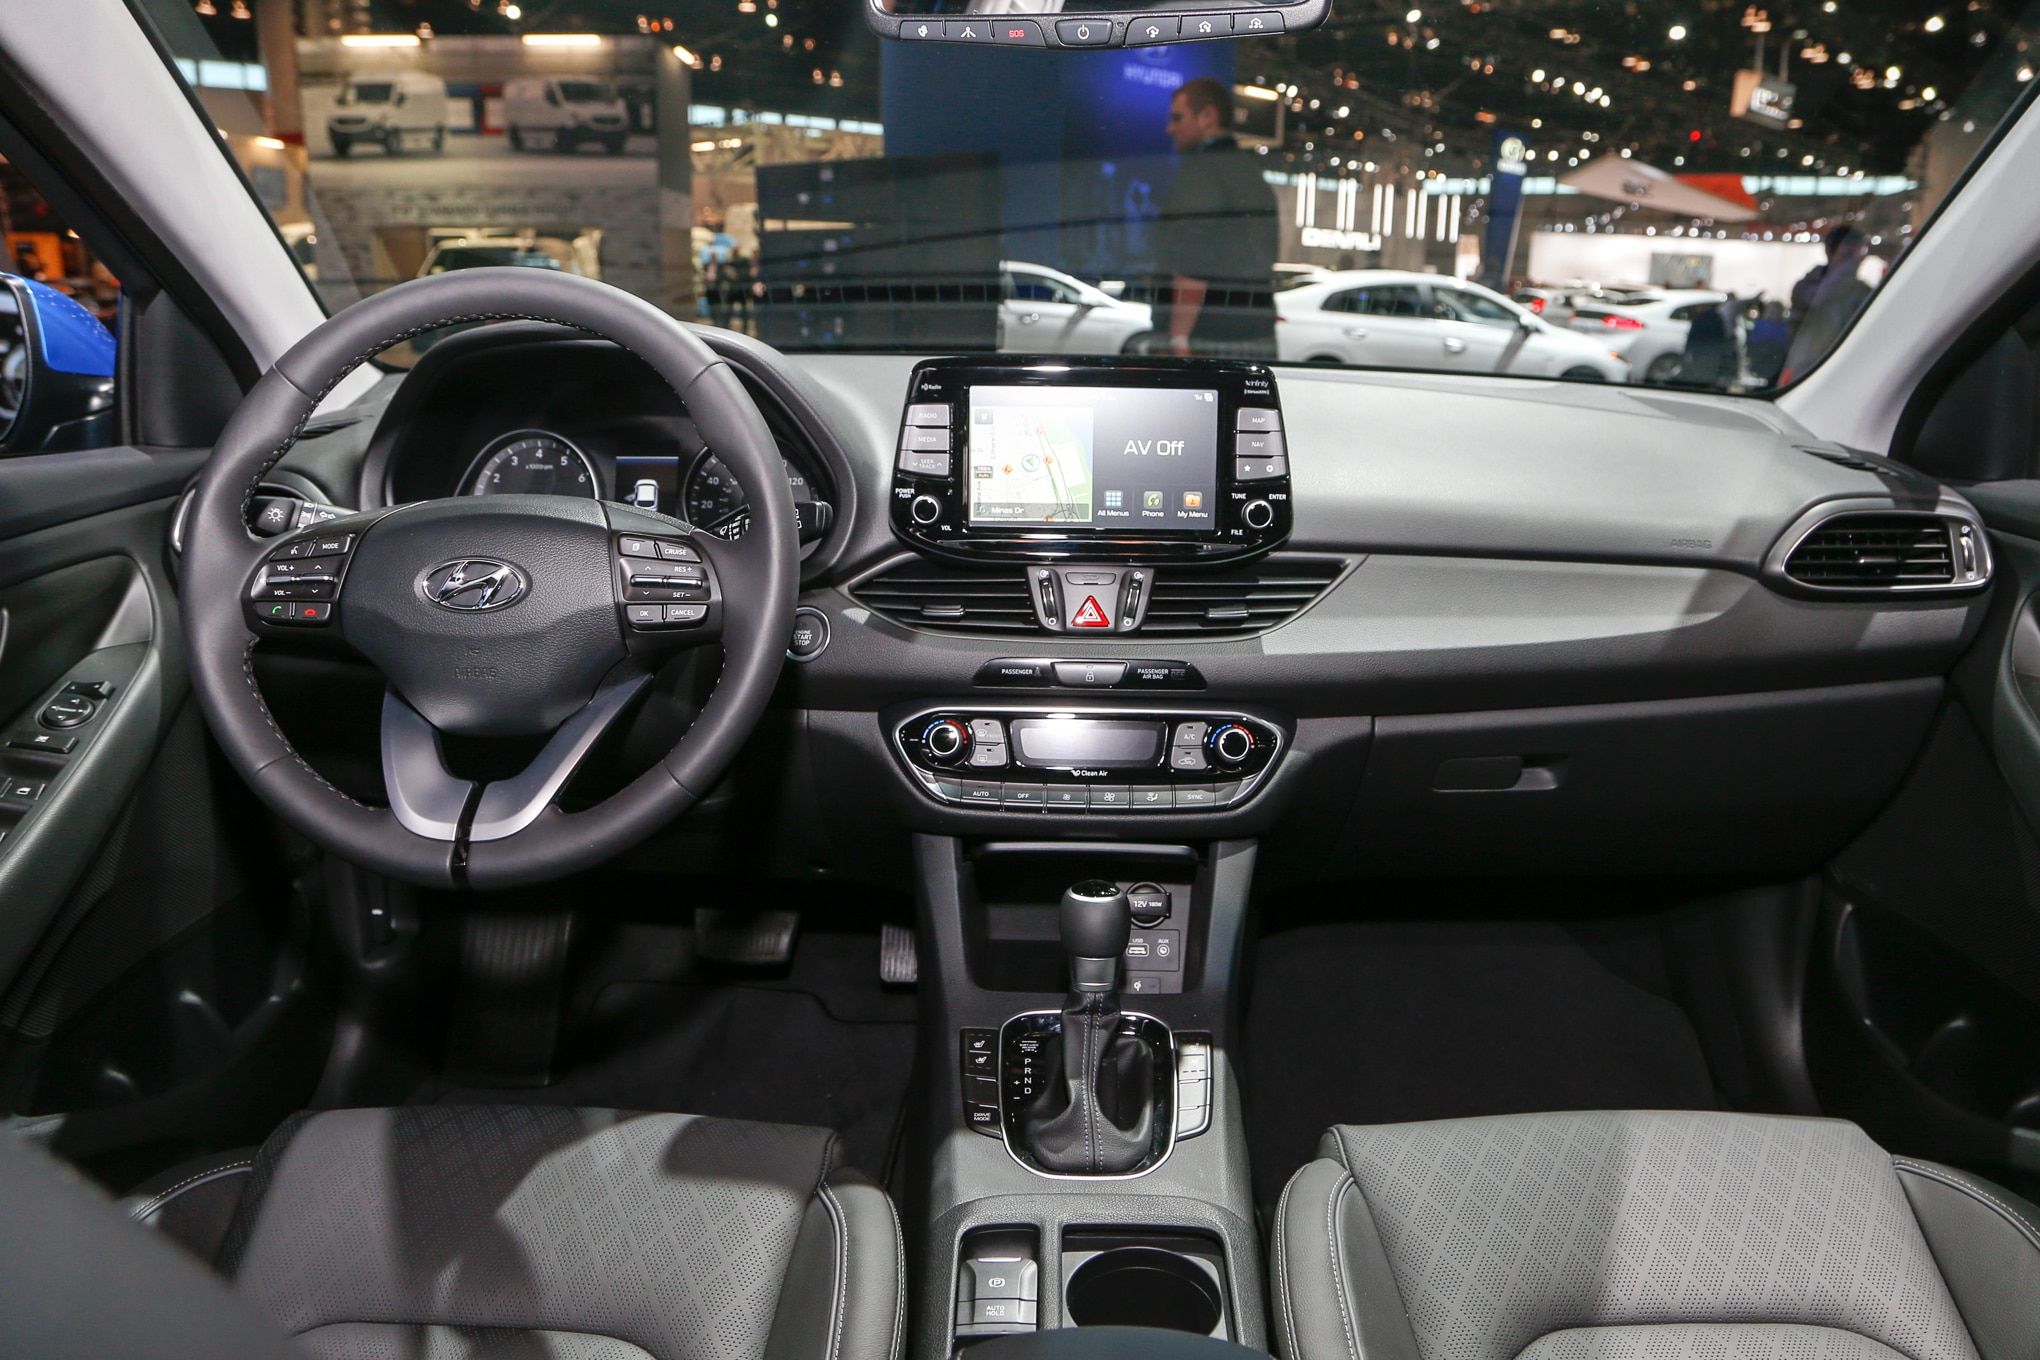 2018 Hyundai Elantra Gt Hatchback Interior View 2 Motor